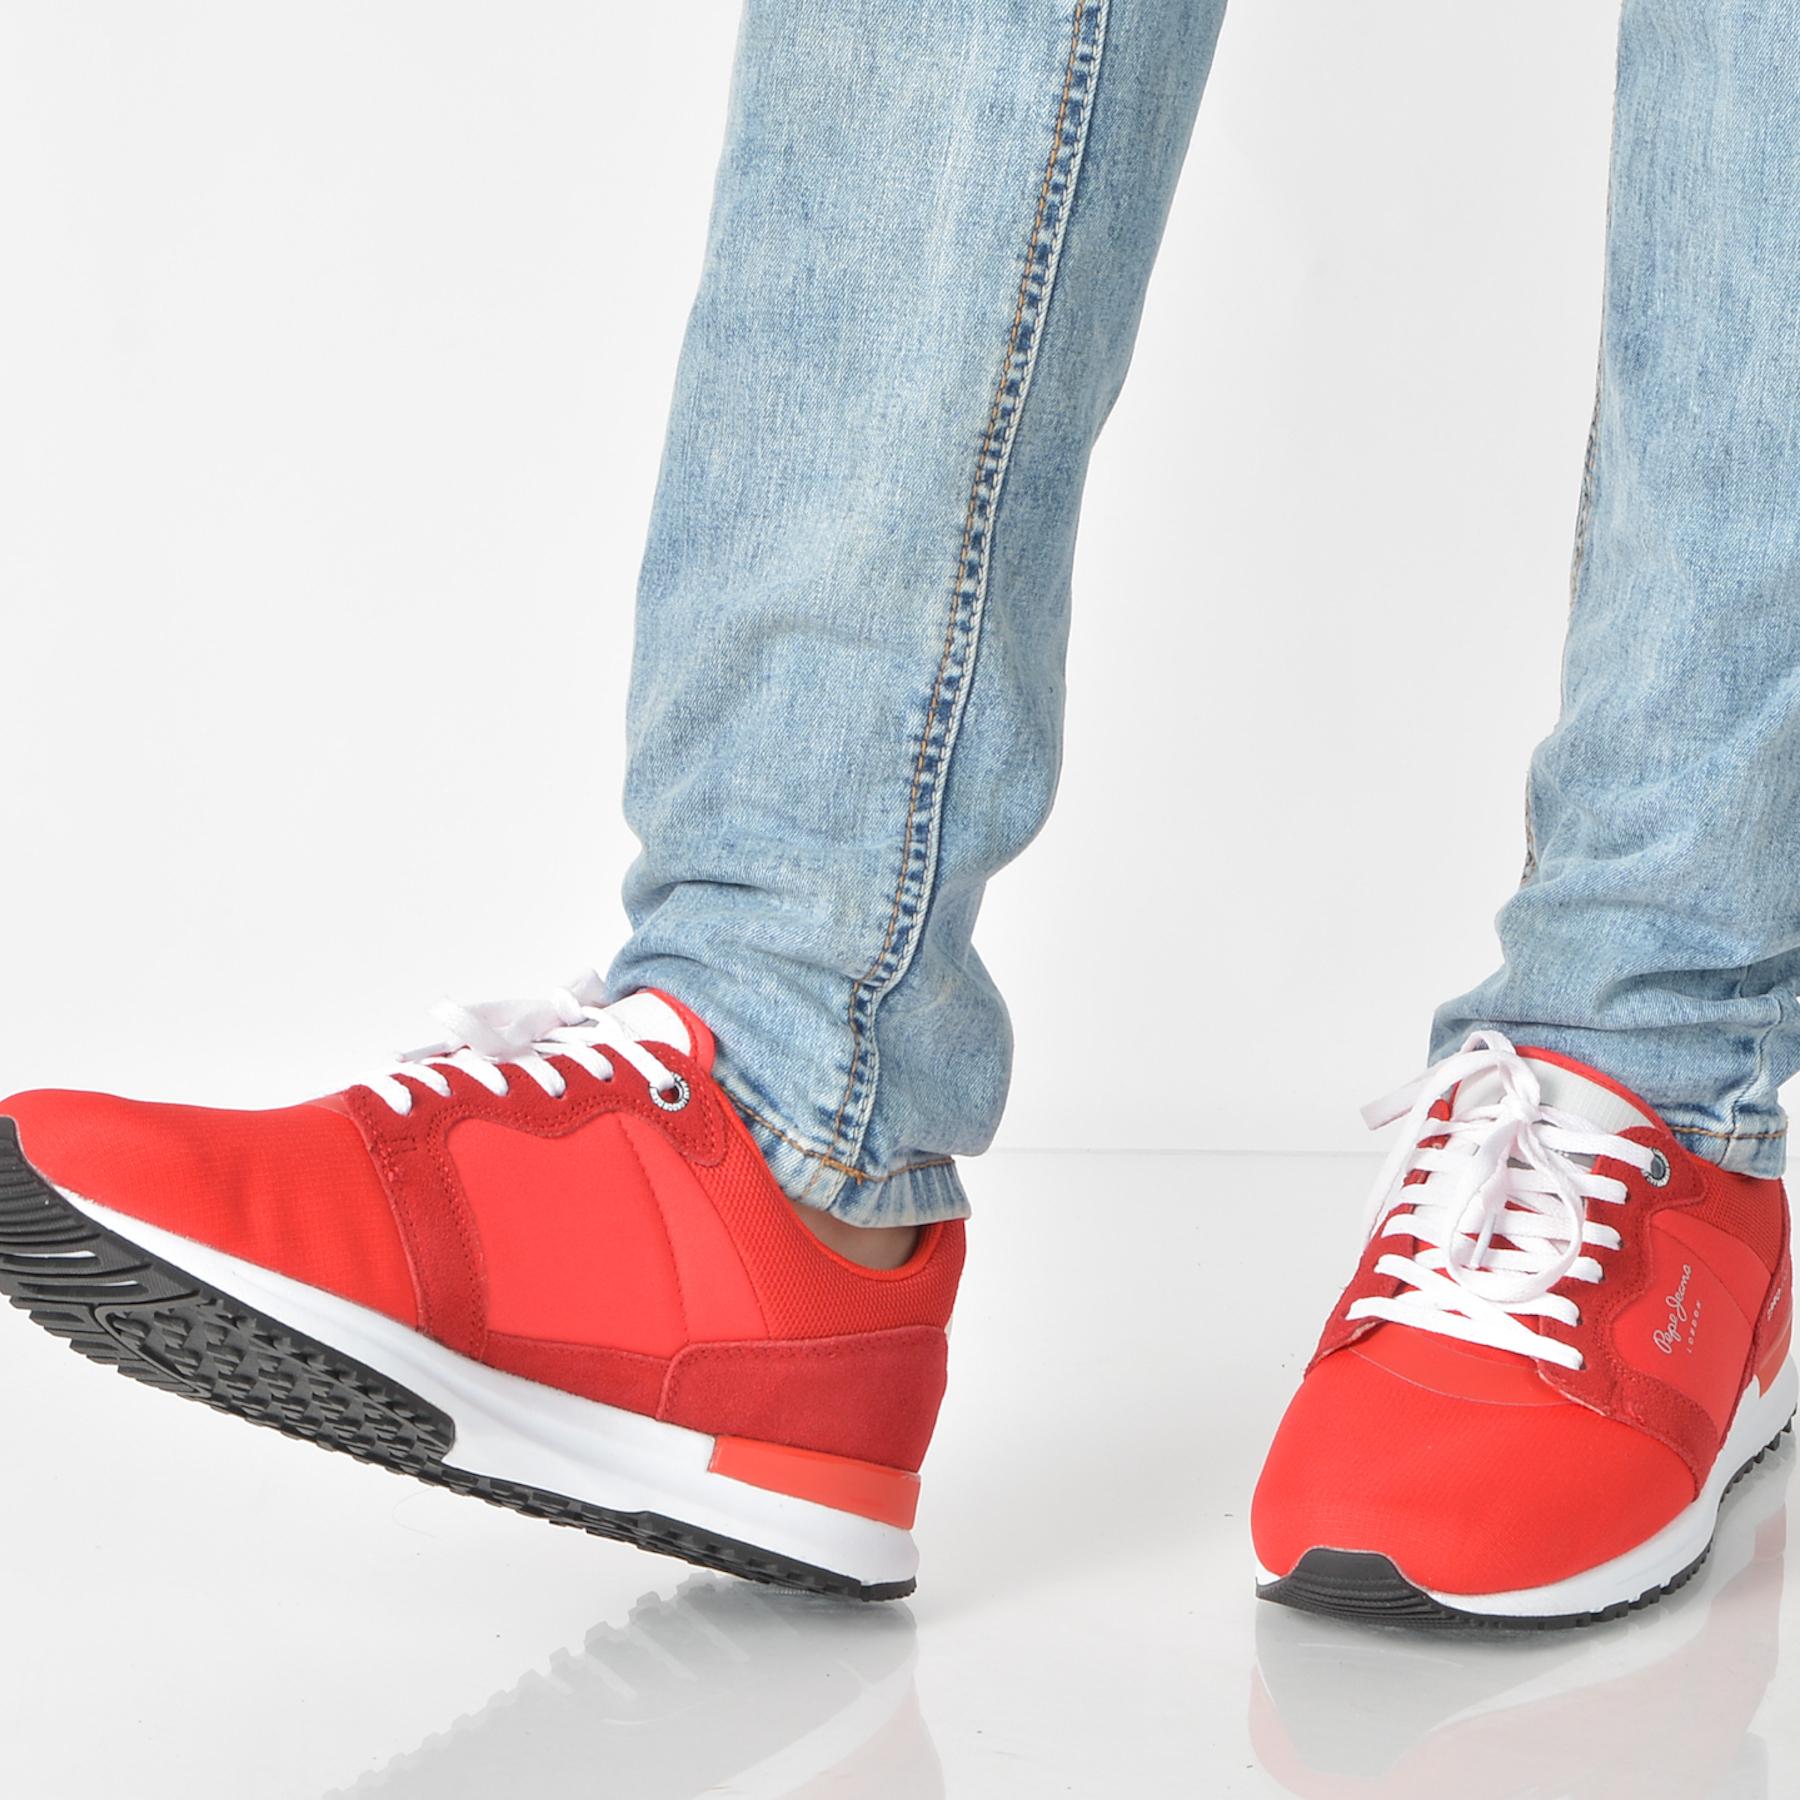 Pantofi Sport Pepe Jeans Rosii, Ms30416, Din Material Textil